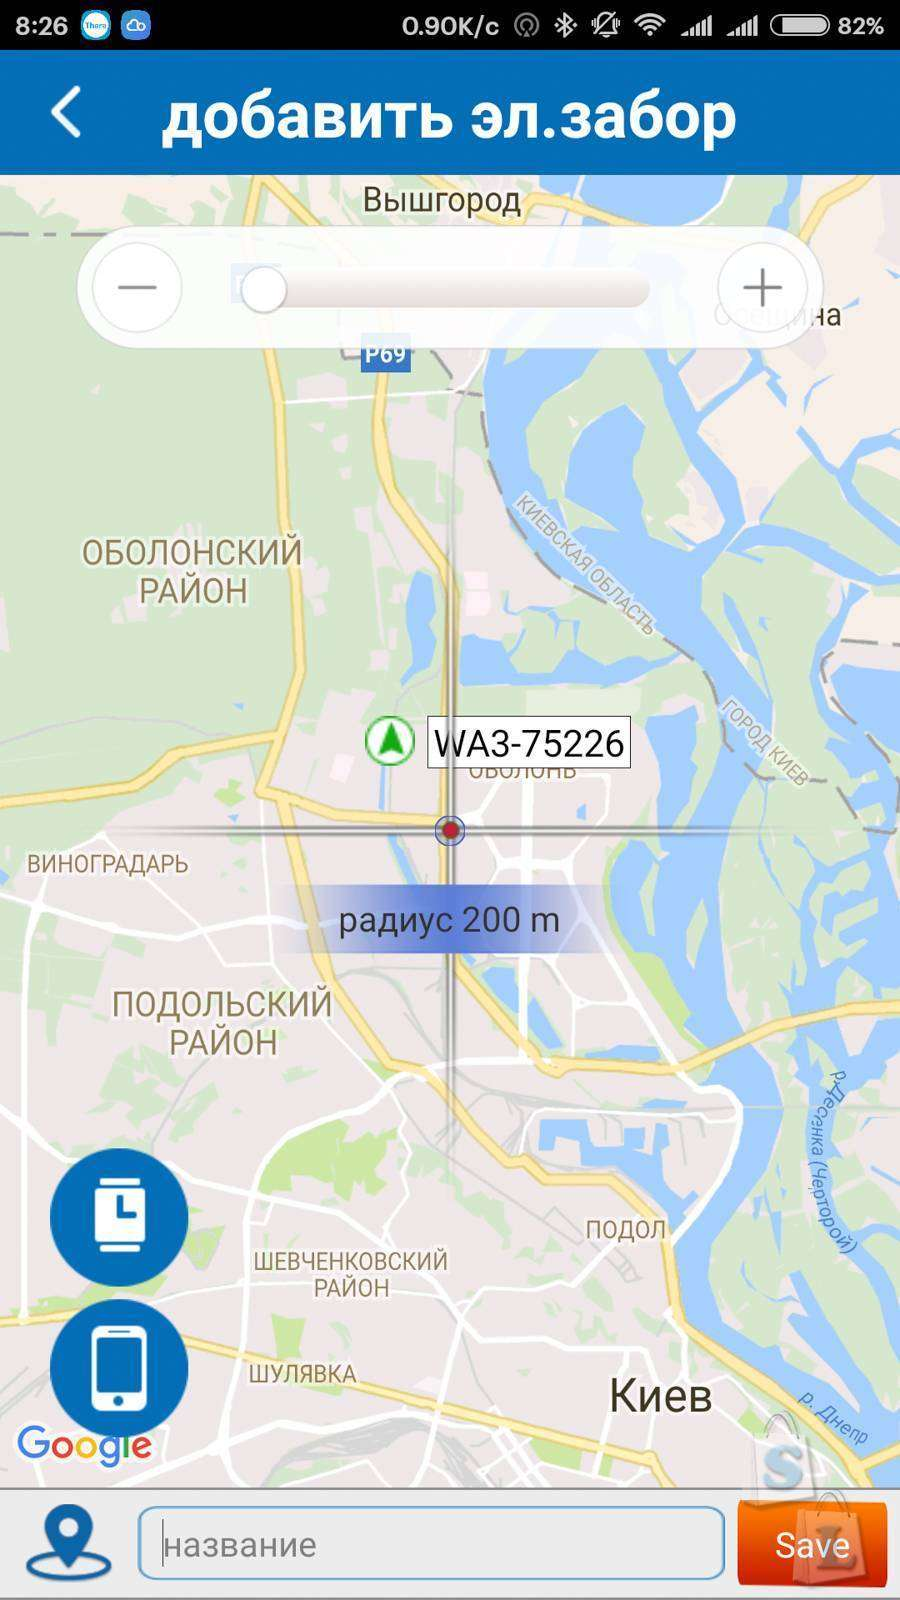 GearBest: Обзор детского GPS трекера - Deest D5